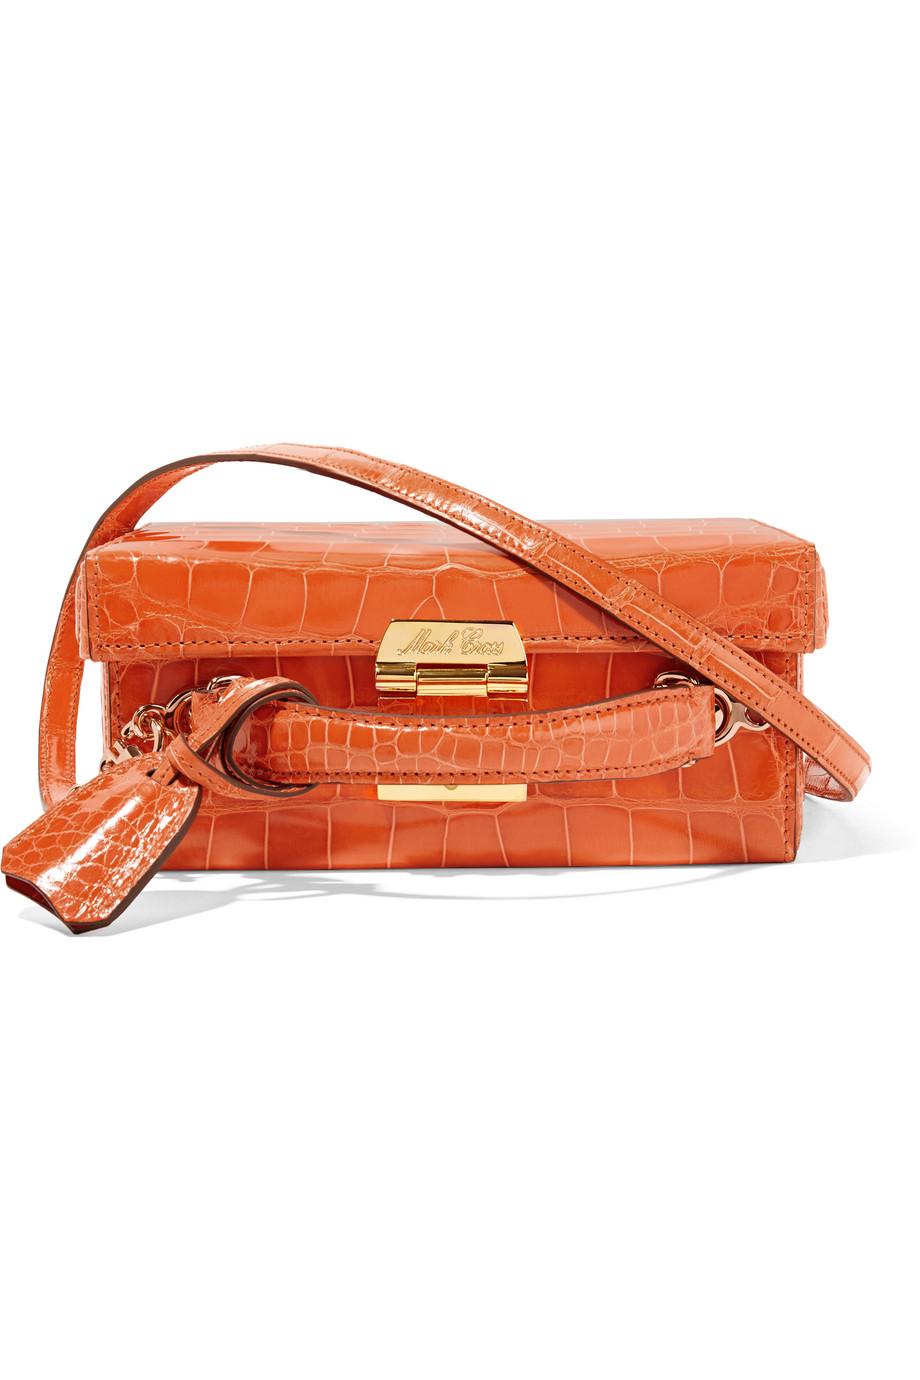 Mark Cross Grace Small Crocodile Shoulder Bag, Bright Orange, Women's